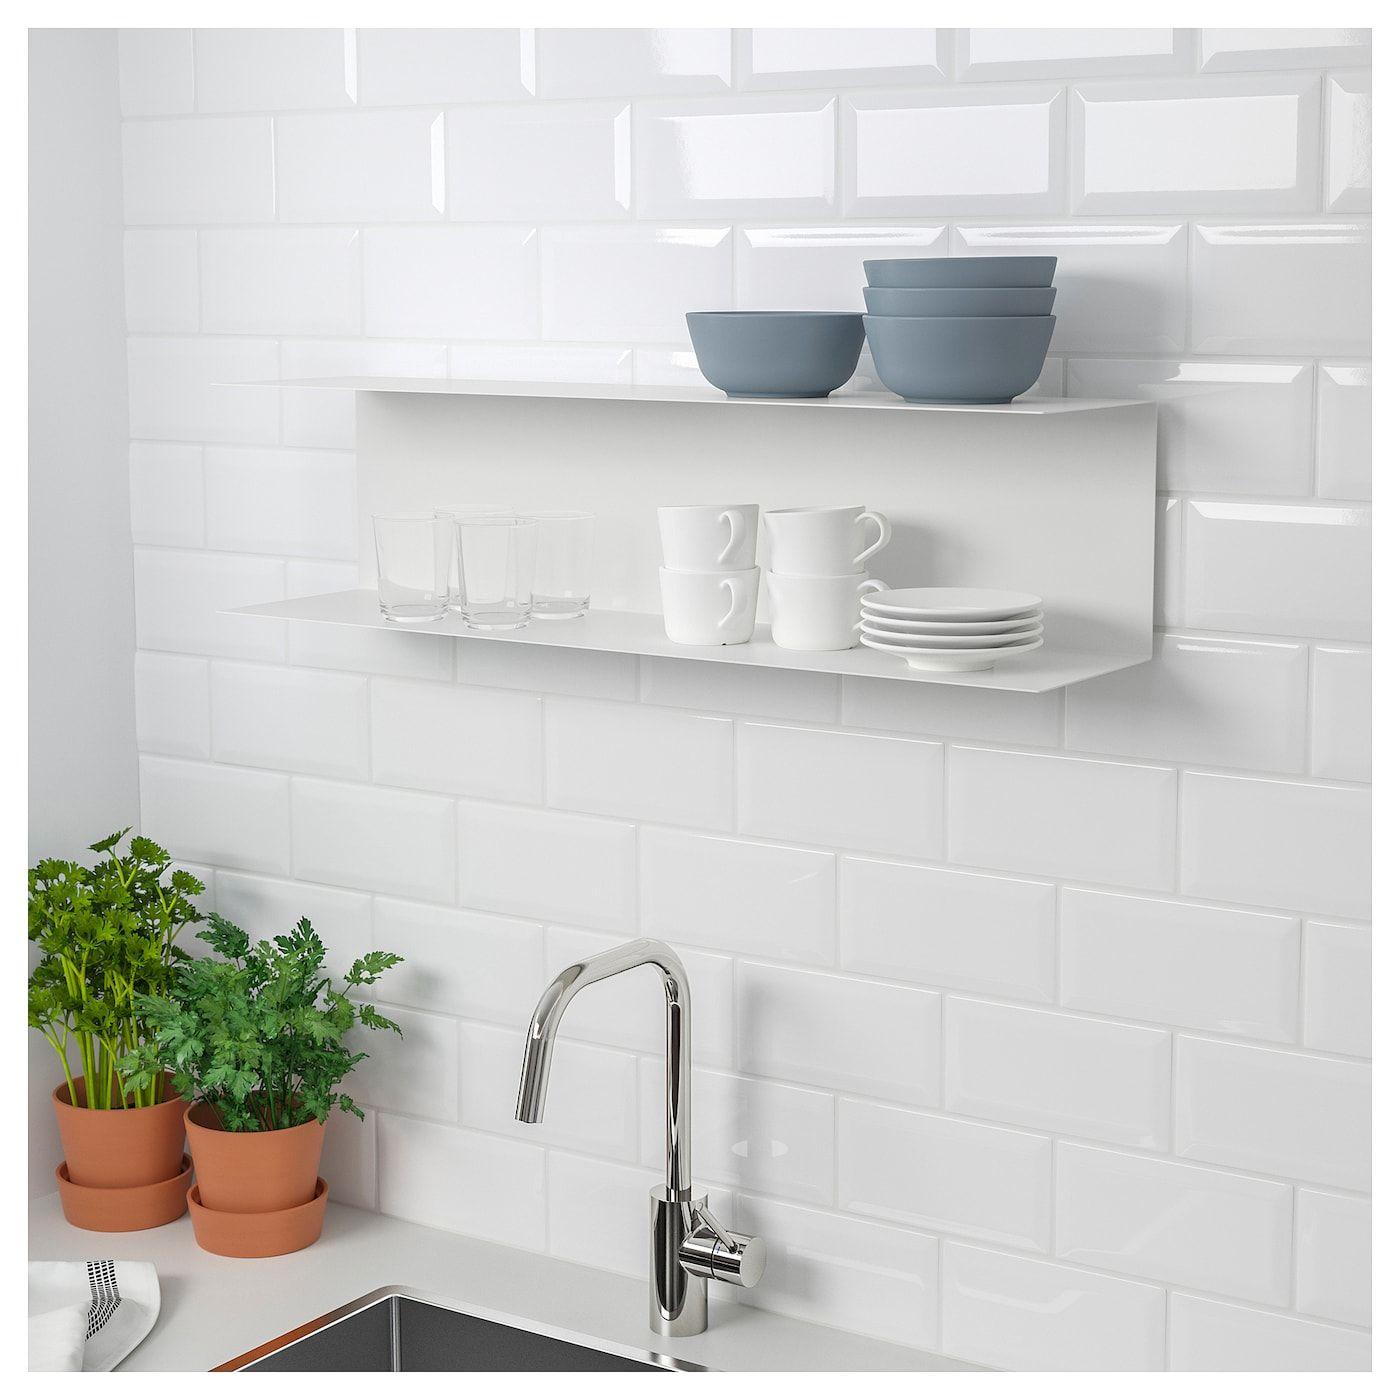 IKEA BOTKYRKA White Wall shelf White wall shelves, Wall